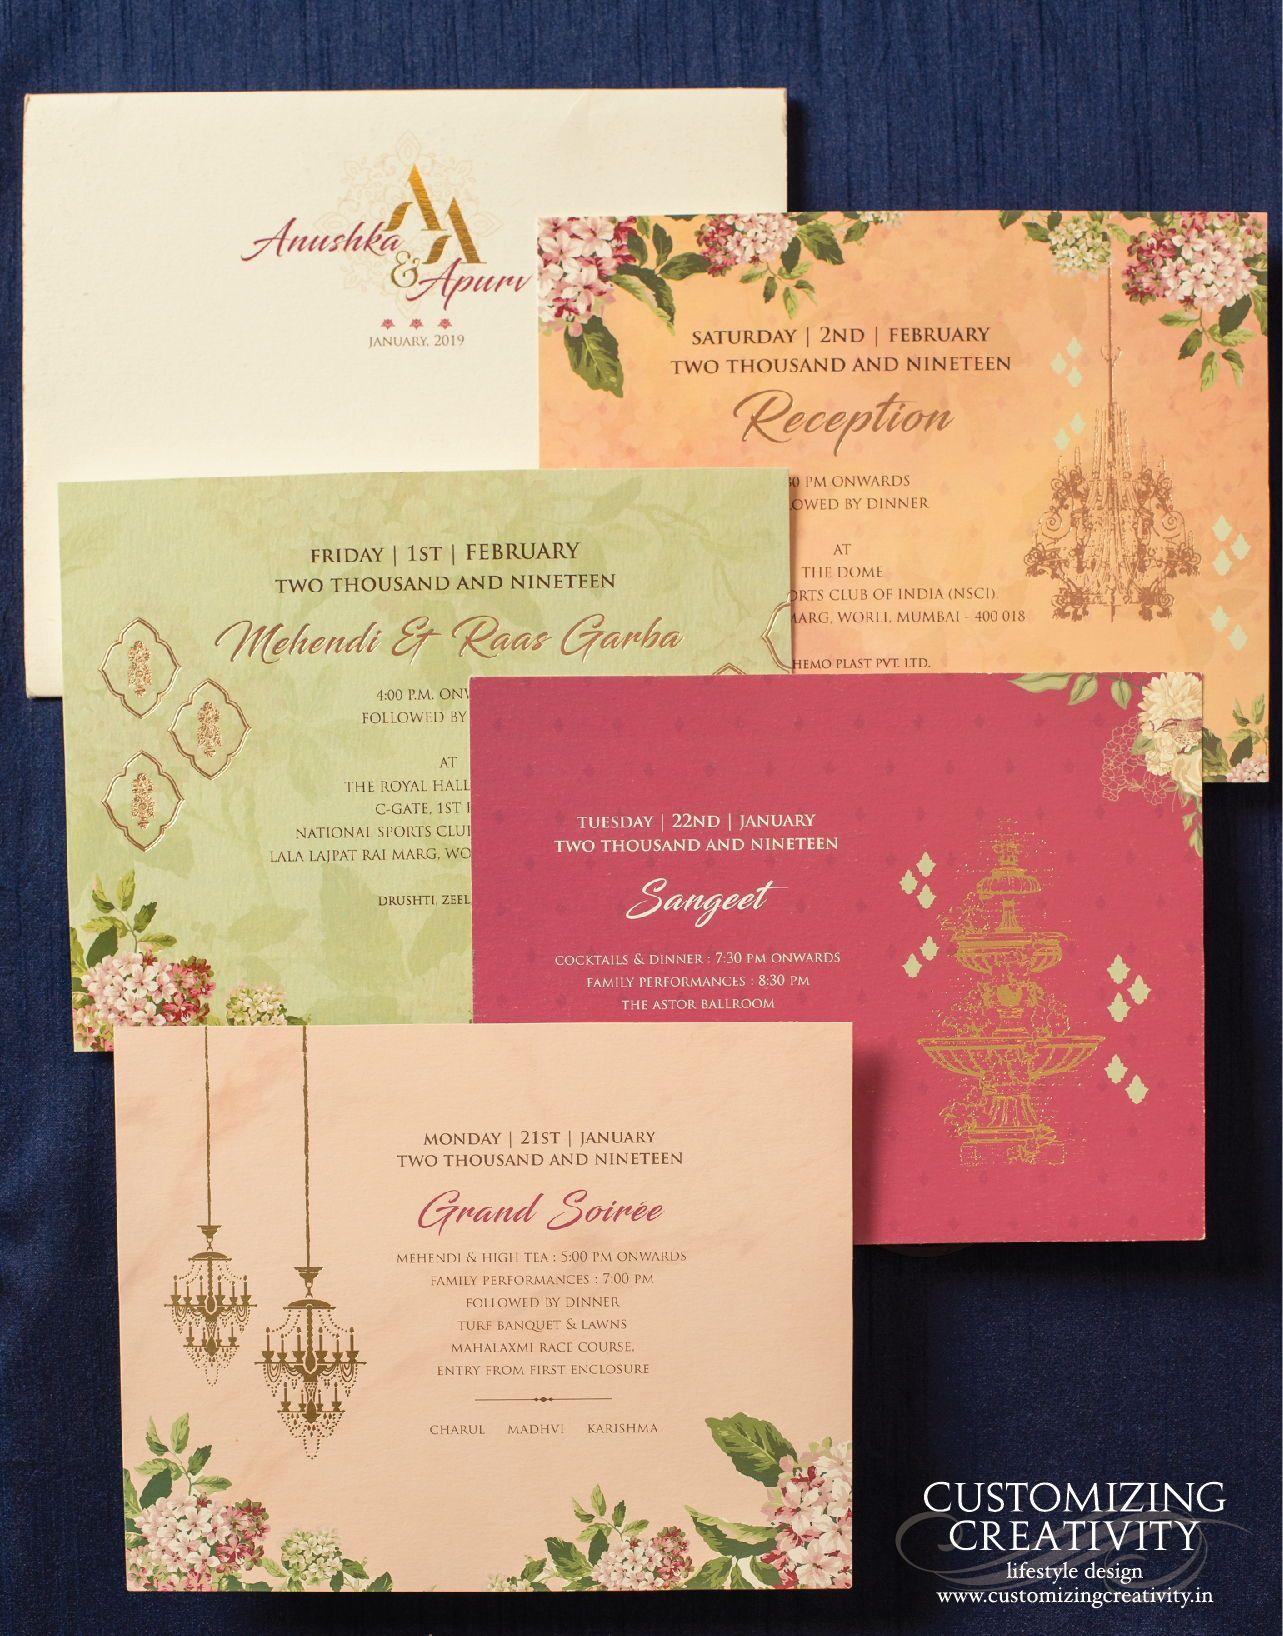 Wedding Invitations Wedding Logo Wedding Invite Wedding Stationery Custom Indian Wedding Invitation Cards Creative Wedding Invitations Simple Wedding Cards